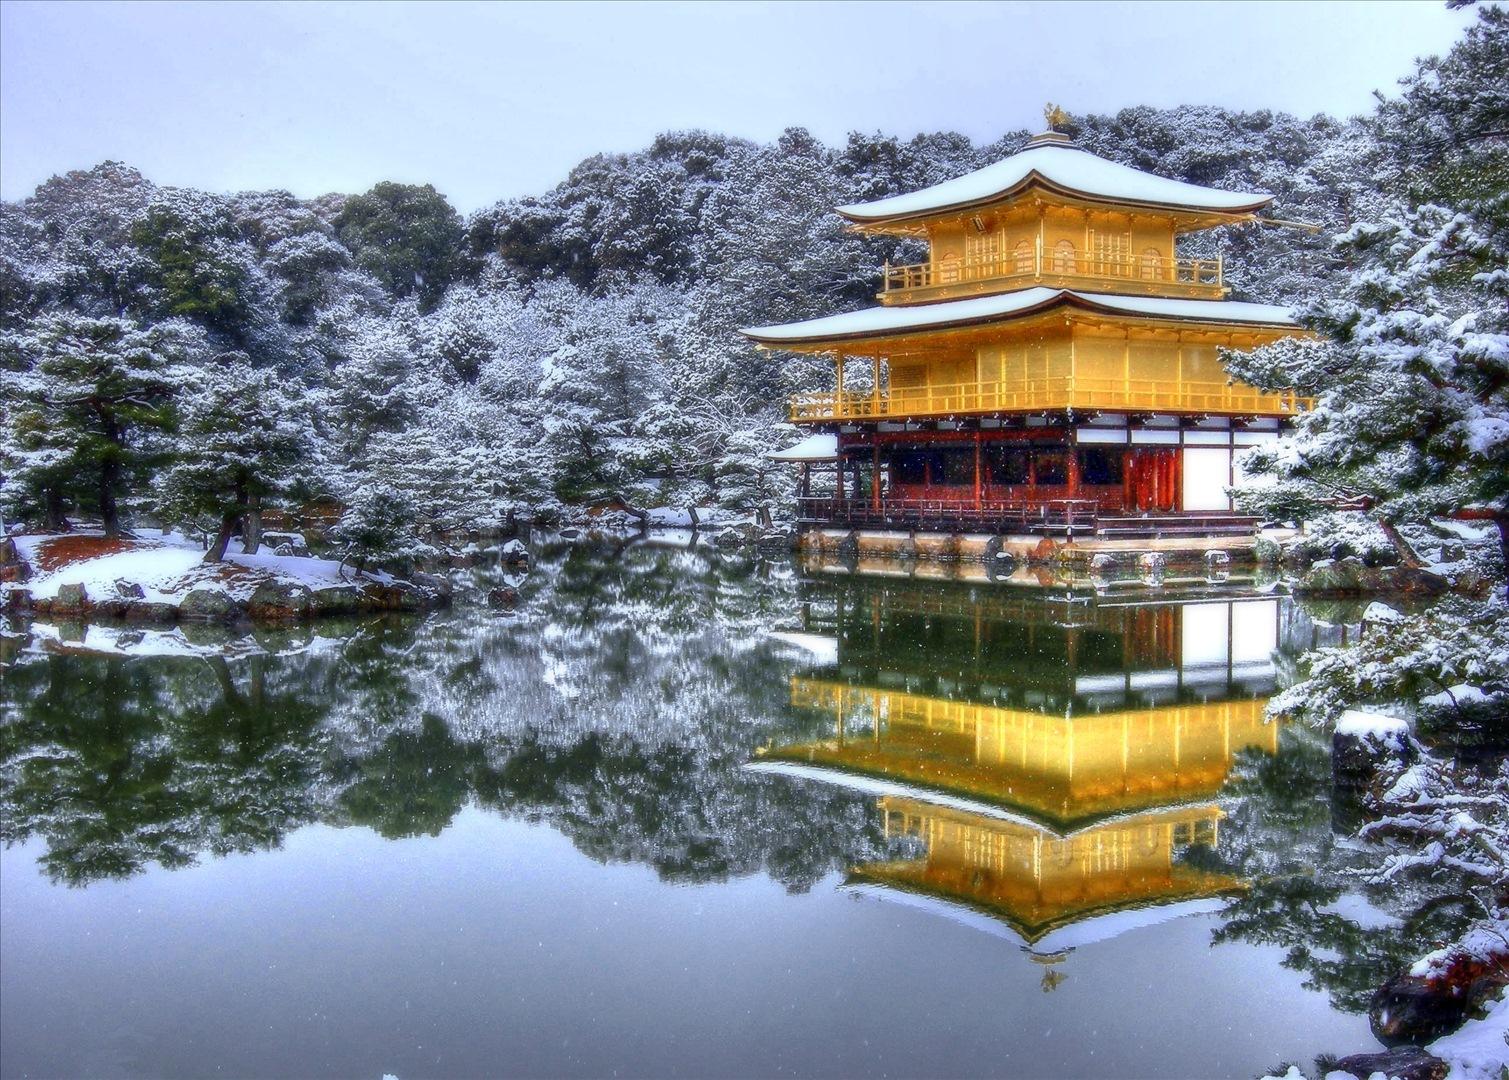 Le Pavillon d'or ou Temple Kinkaku-Ji, Kyoto (source : clementsgeoff.com)